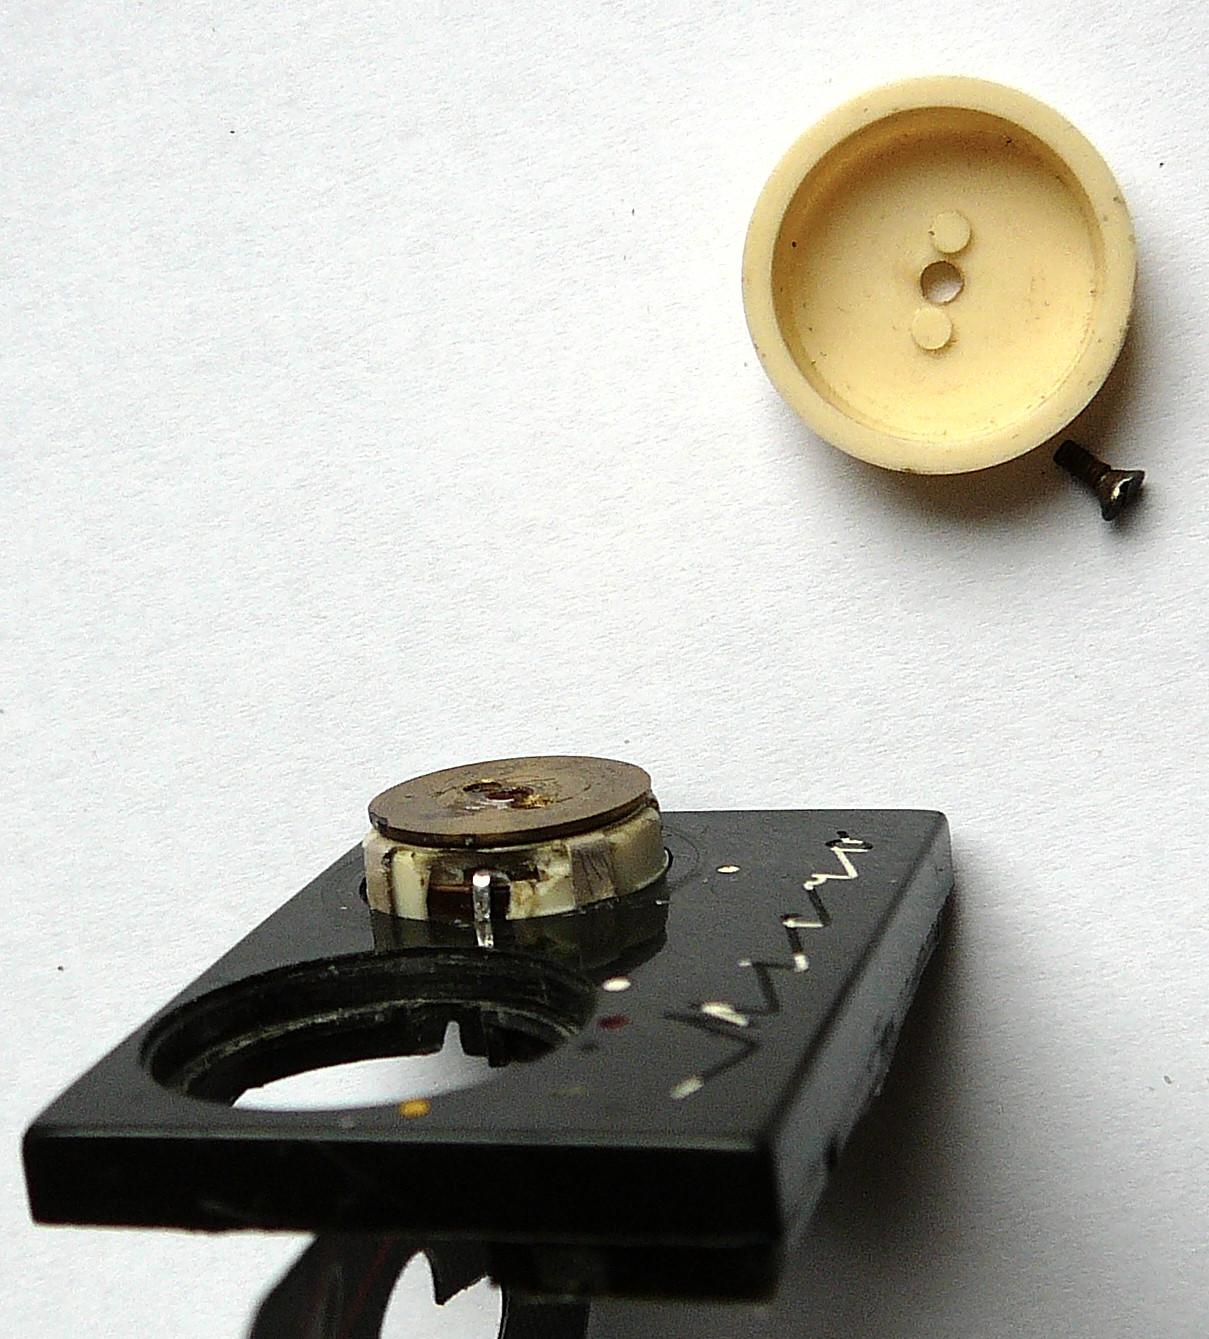 r u00e9pararation d u0026 39 un micro transistor russe - technique